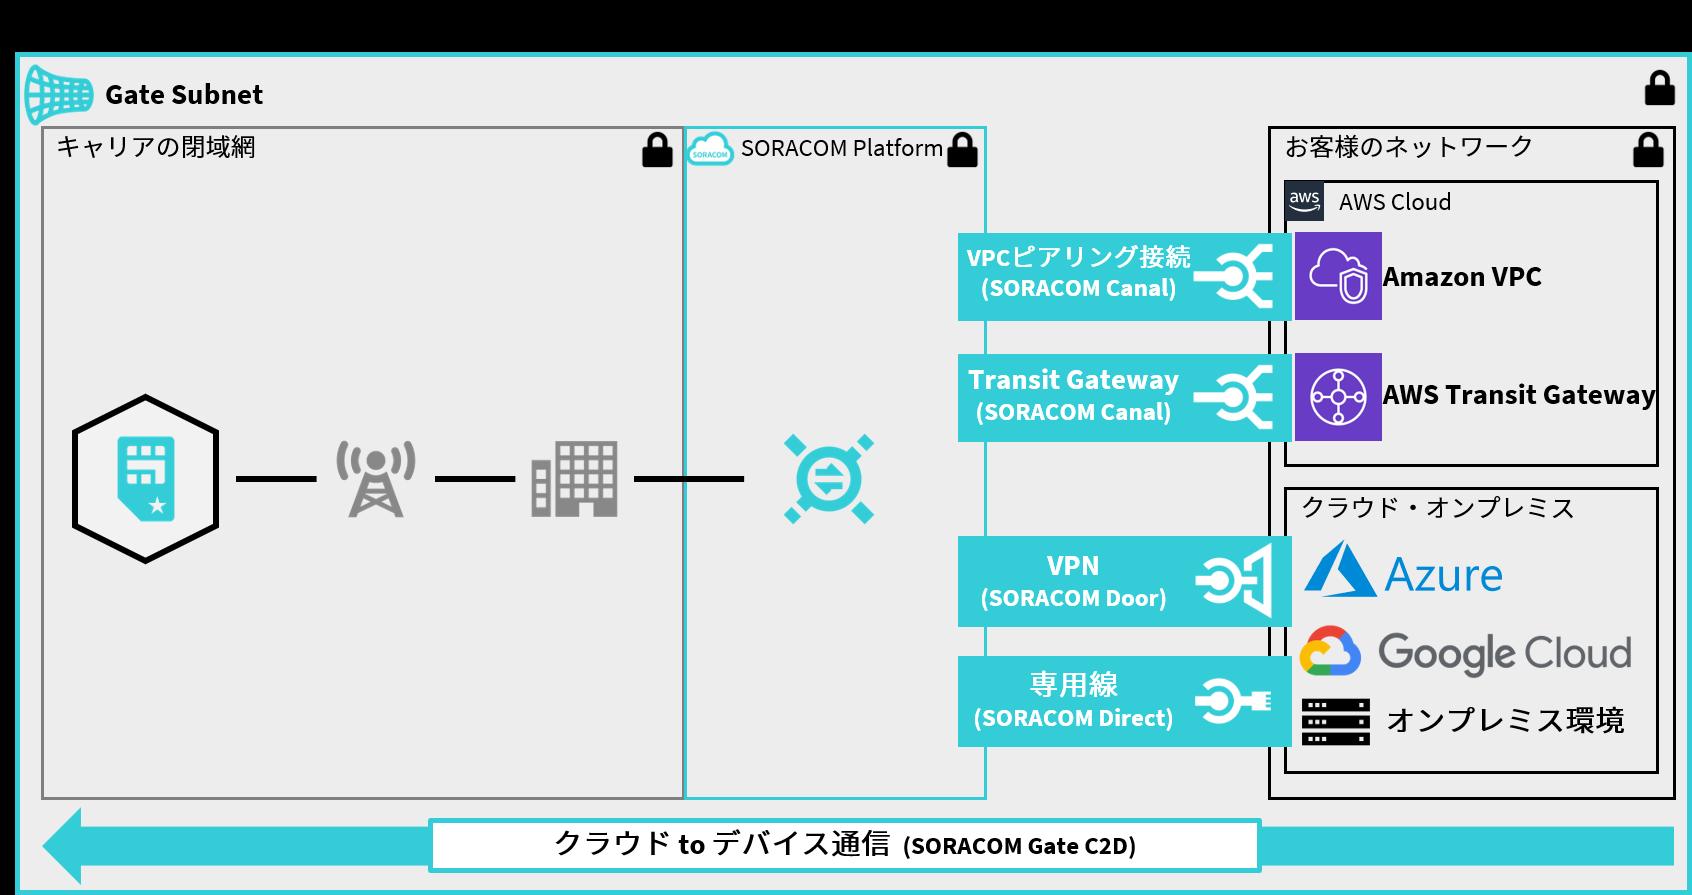 SORACOM Gate C2D